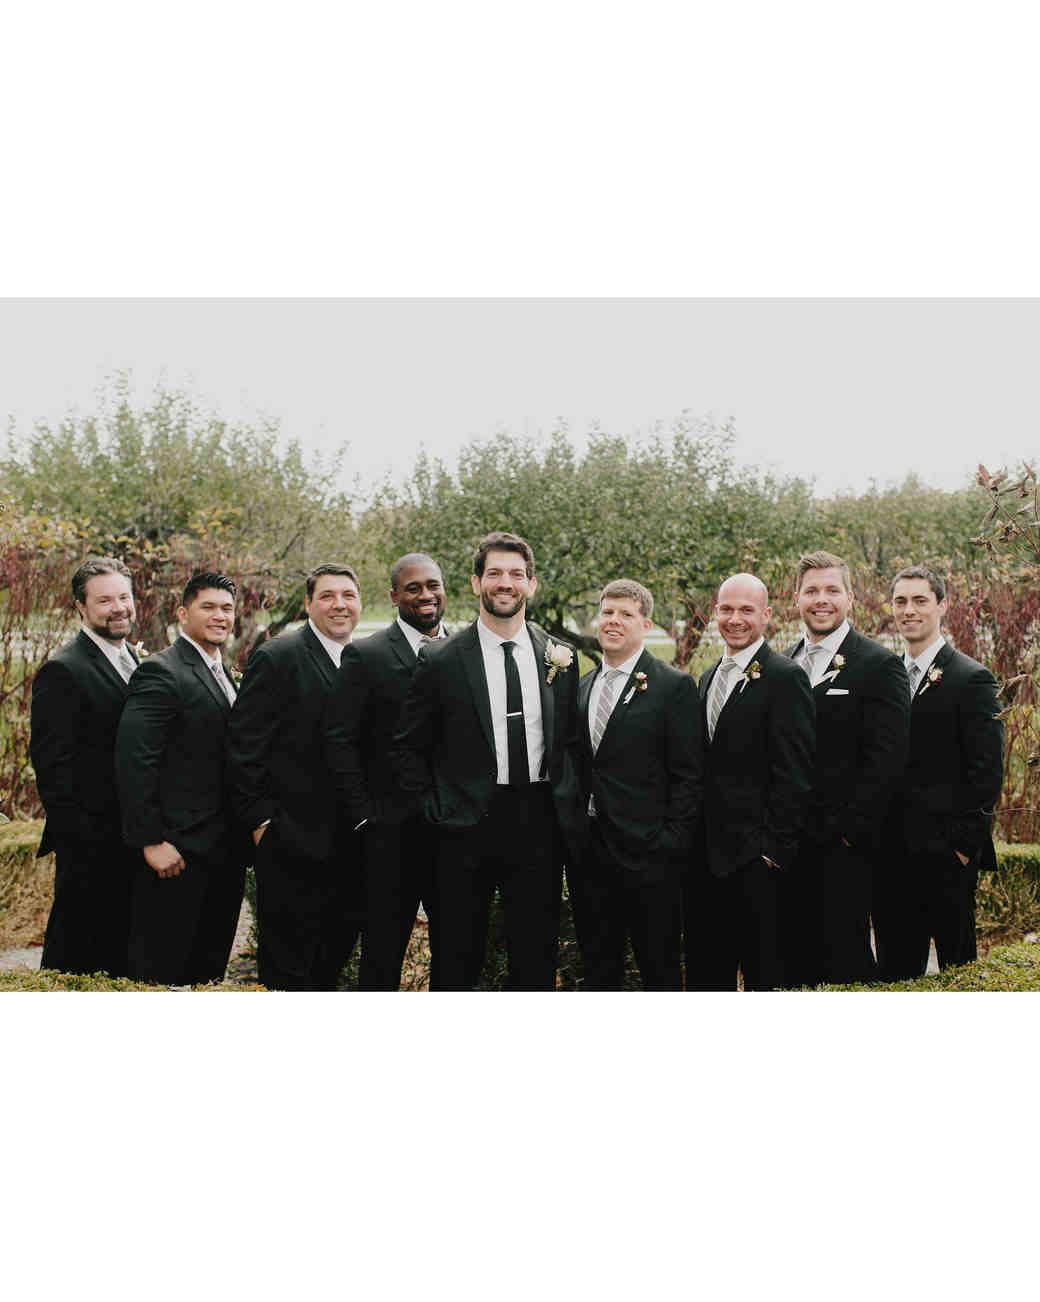 rosie-constantine-wedding-groomsmen-350-s112177-1015.jpg